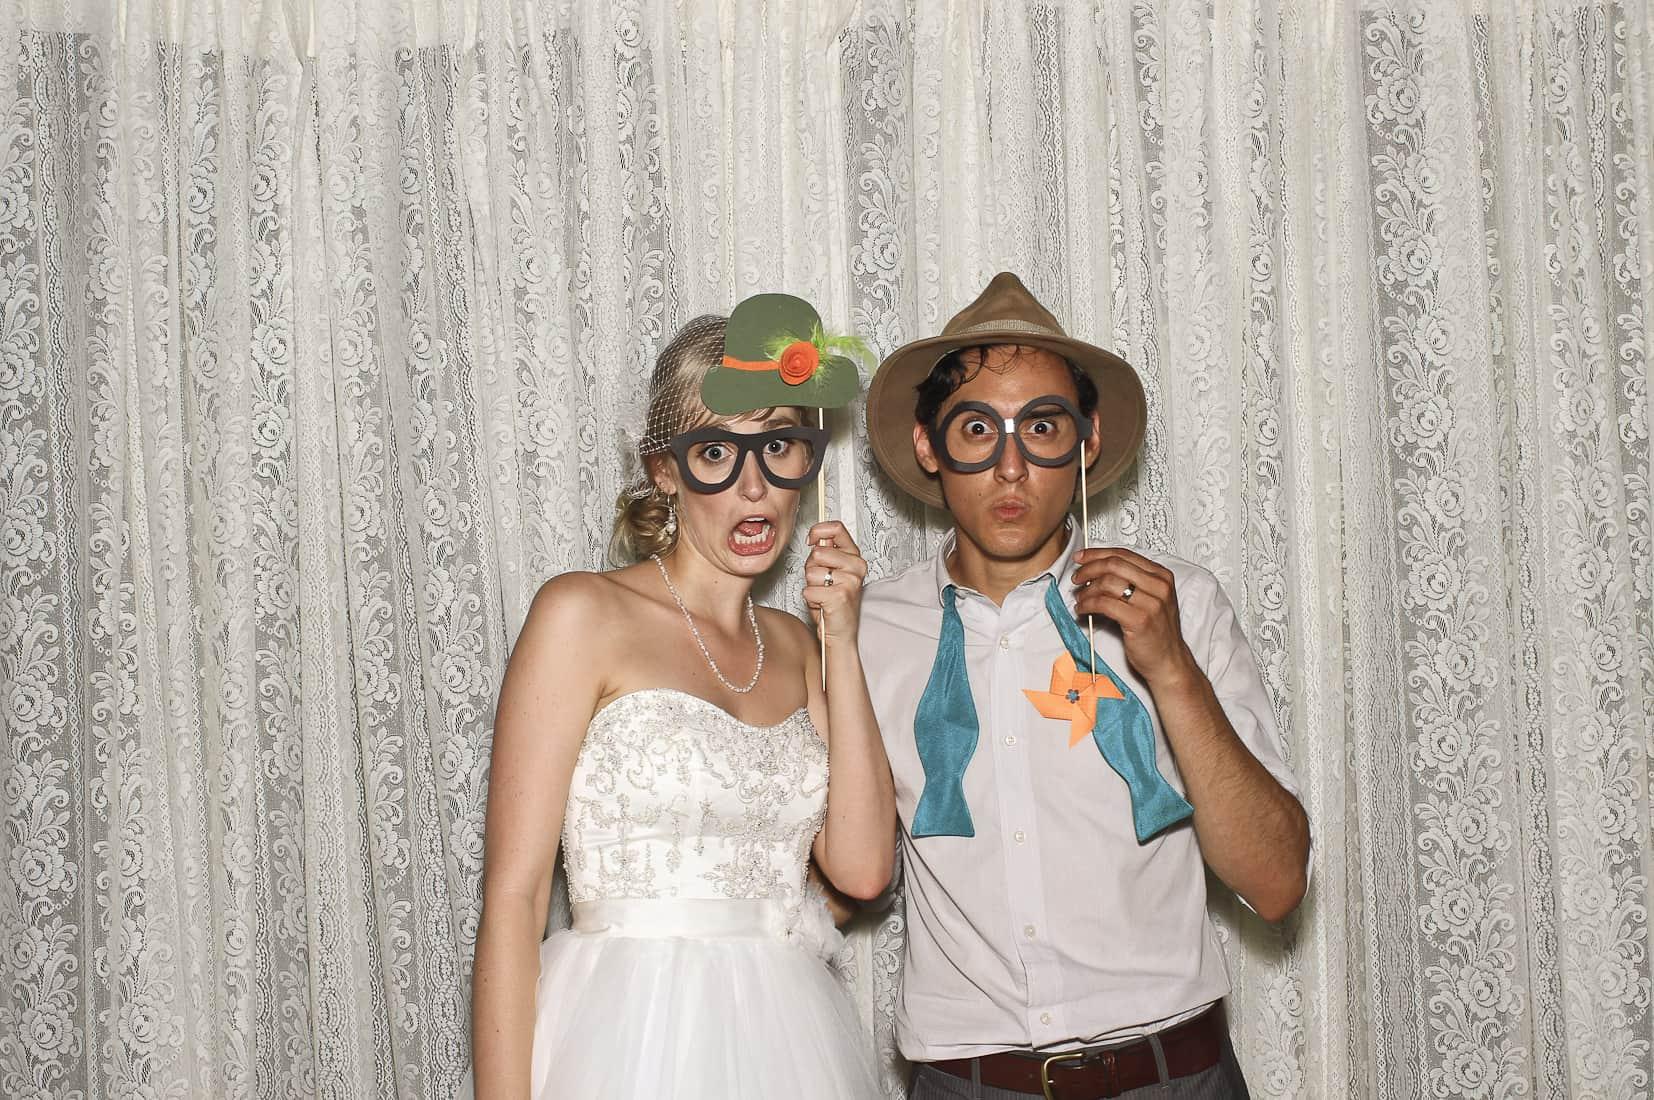 Bride & Groom Photobooth